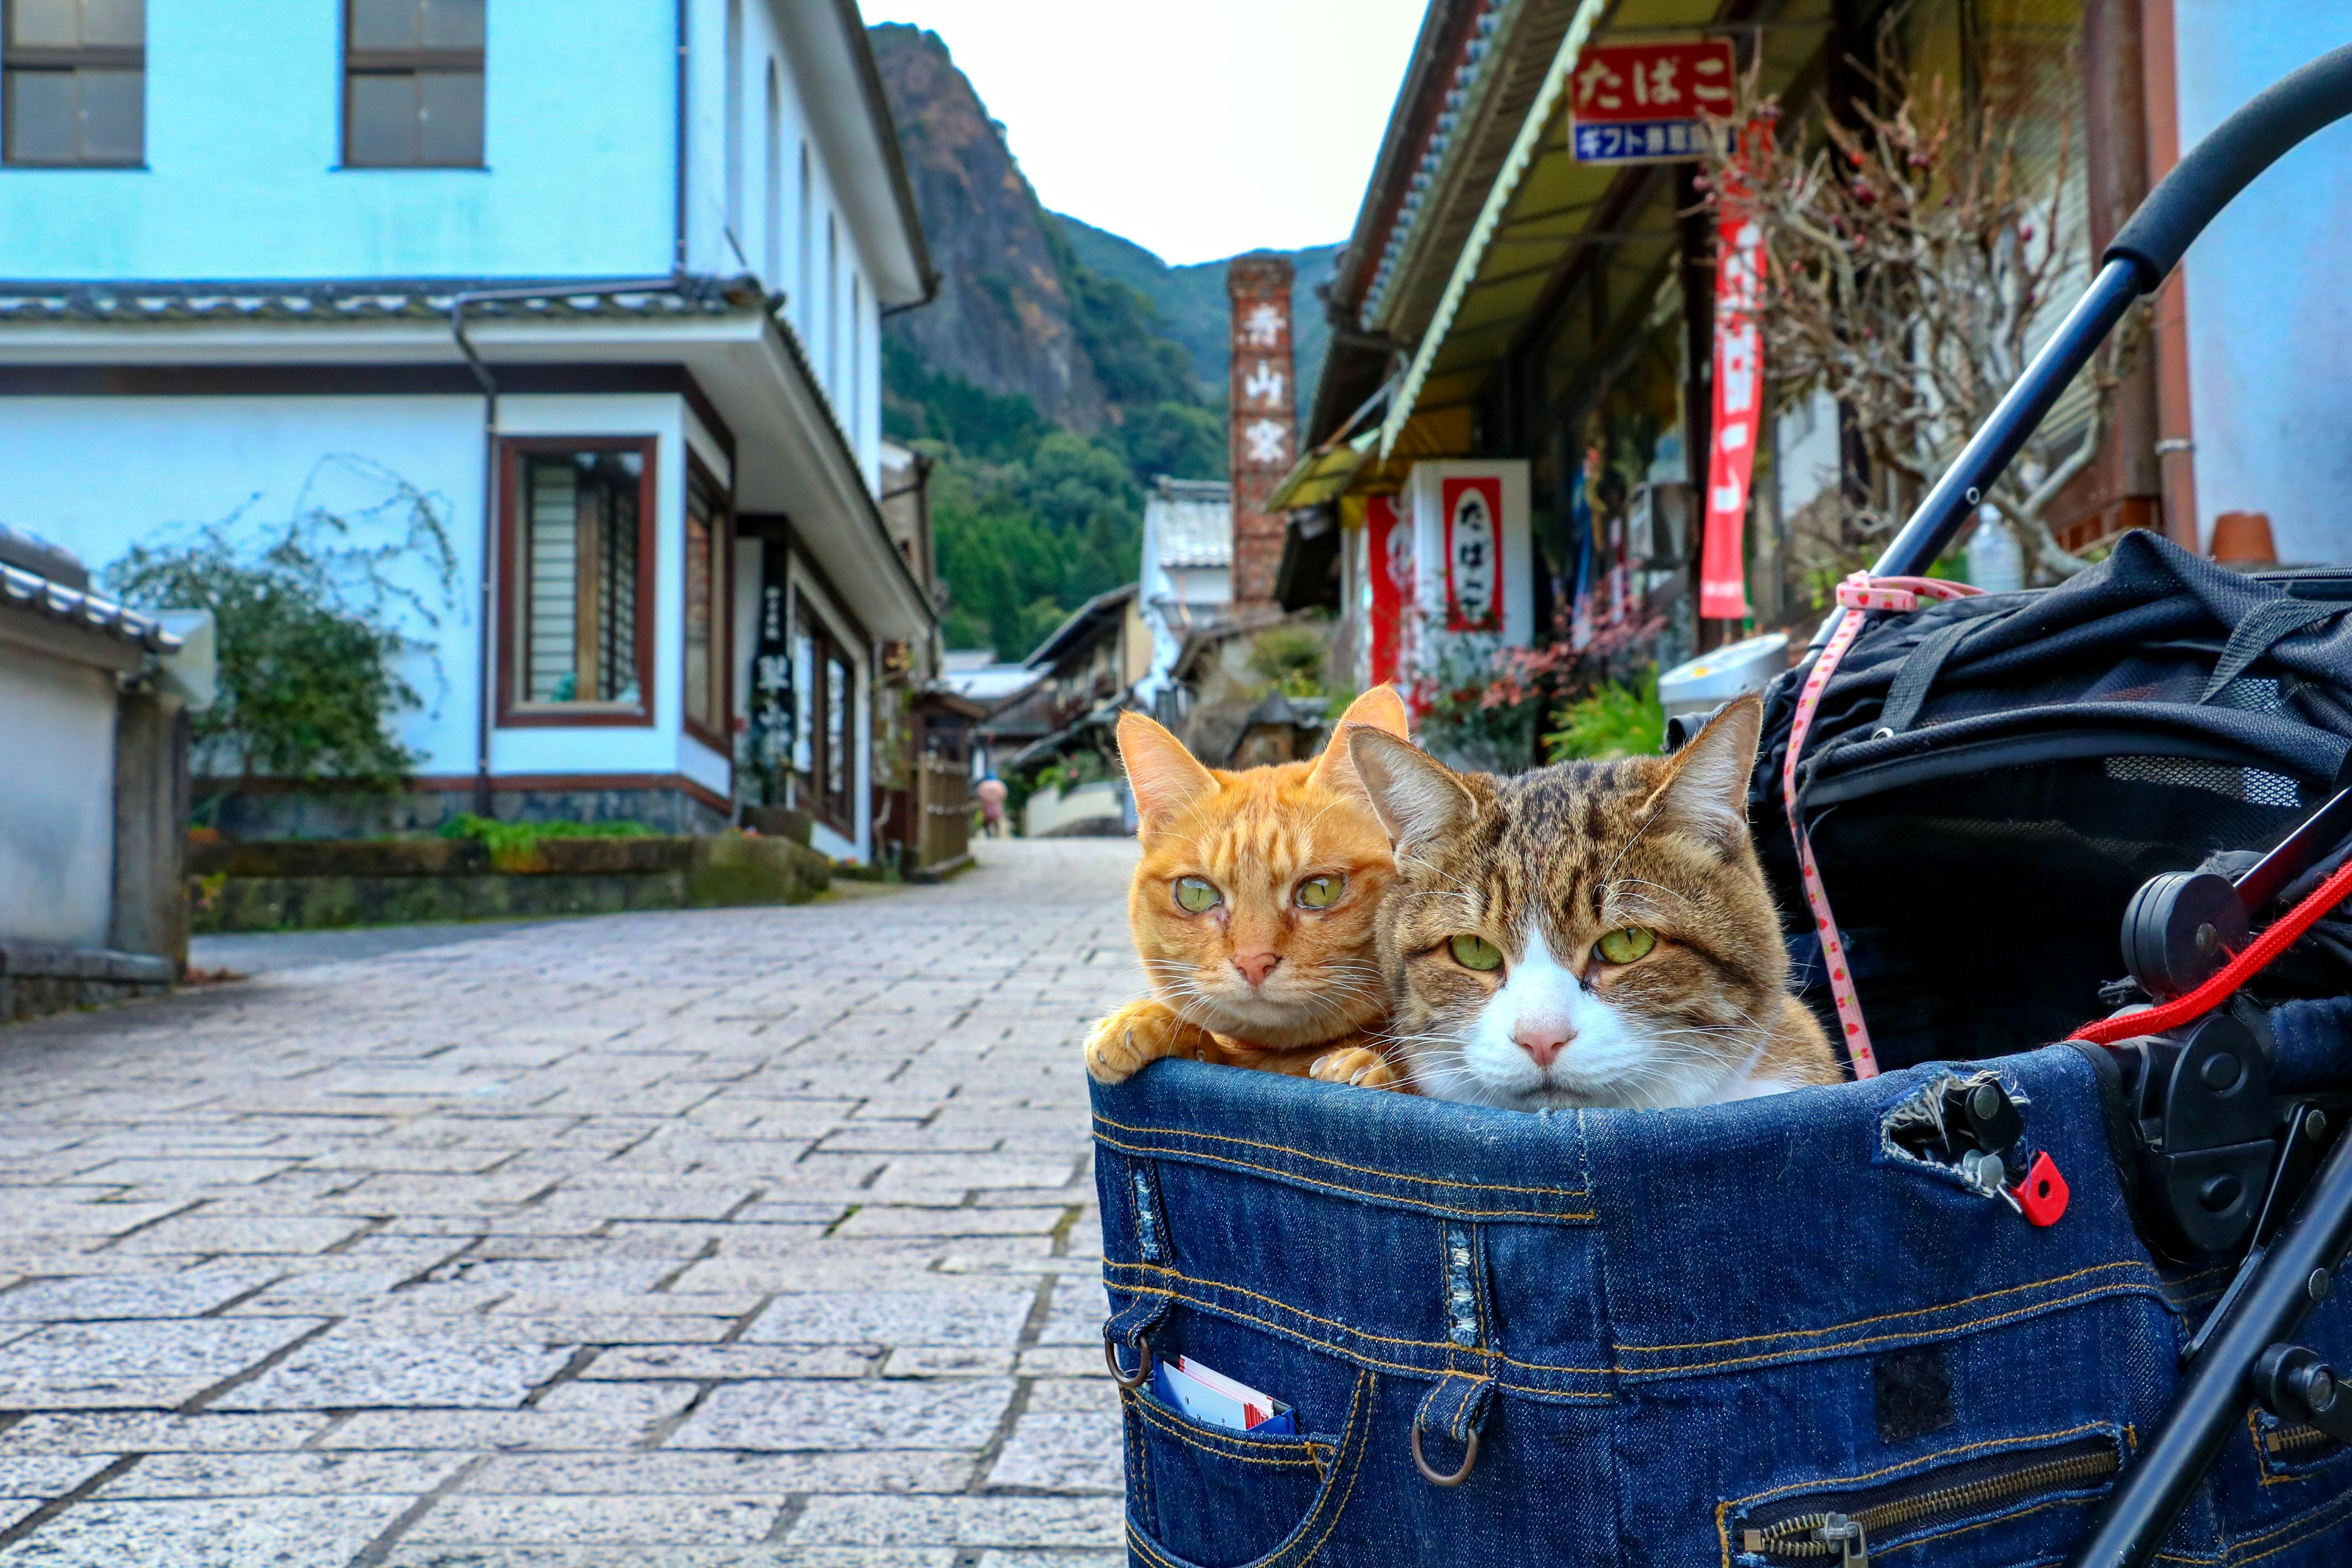 <p>Japanese tech executive Daisuke Nagasawa travels nationally and internationally with his cats, Fuku-Chan and Daikichi. (Photo: Daisuke Nagasawa/Caters News) </p>